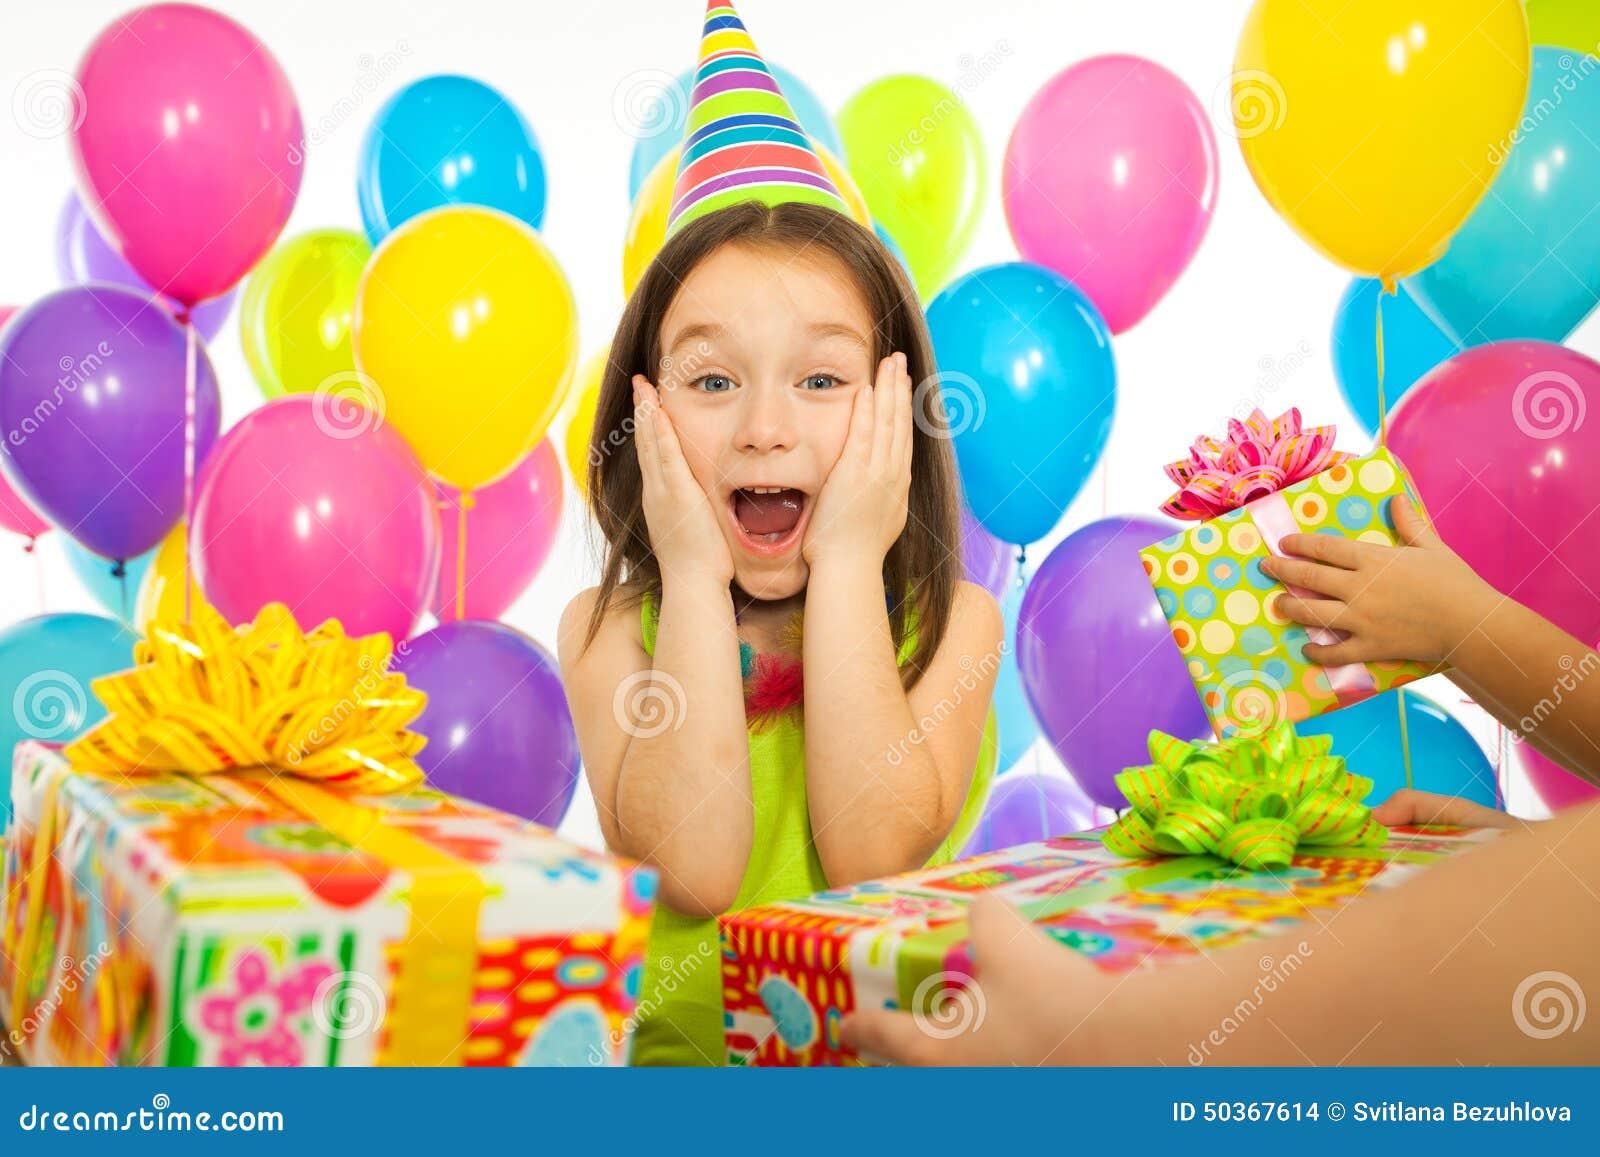 Joyful Little Kid Girl Receiving Gifts At Birthday